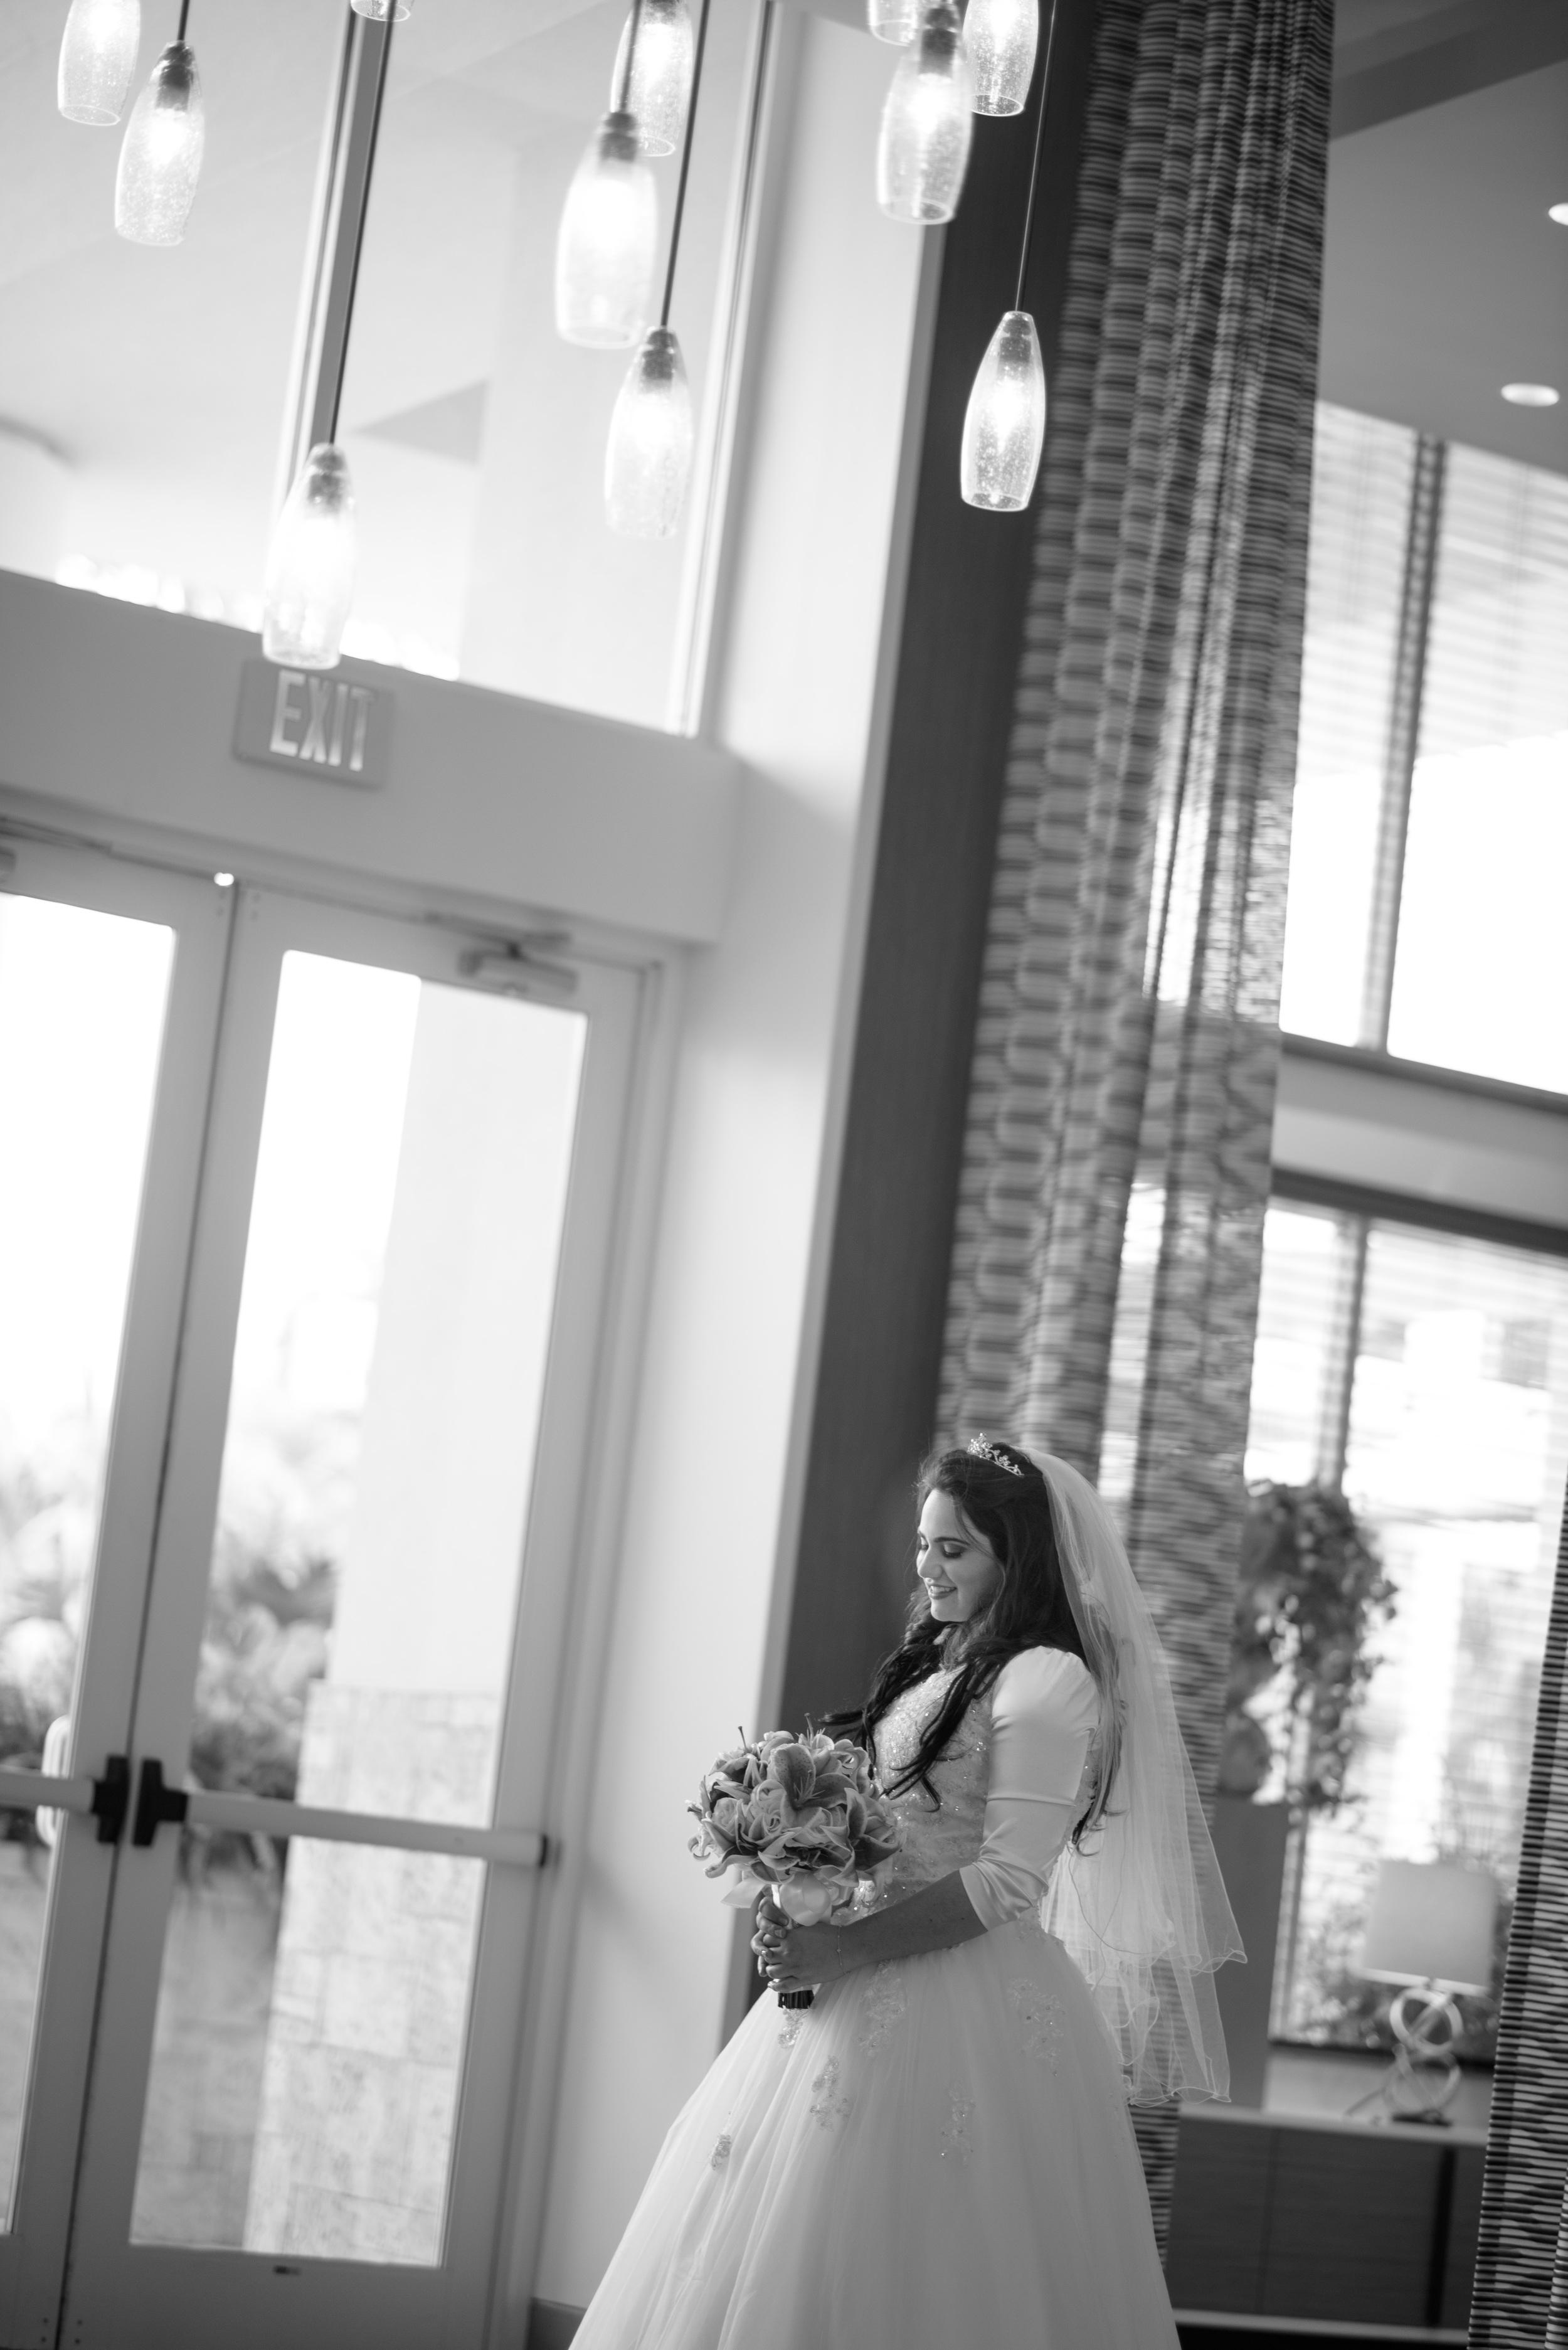 Wedding by Levikfoto.com-081.jpg